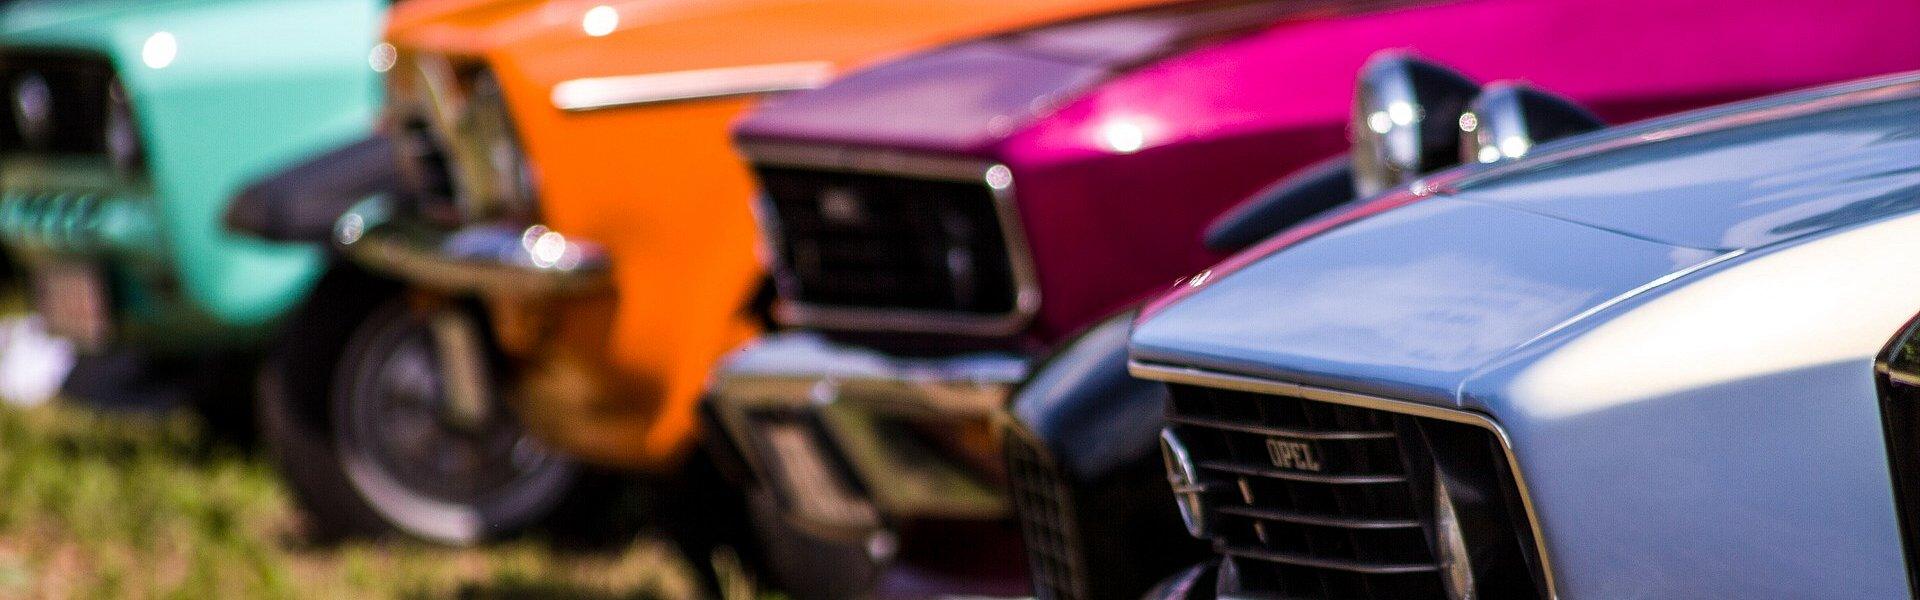 autos-opel